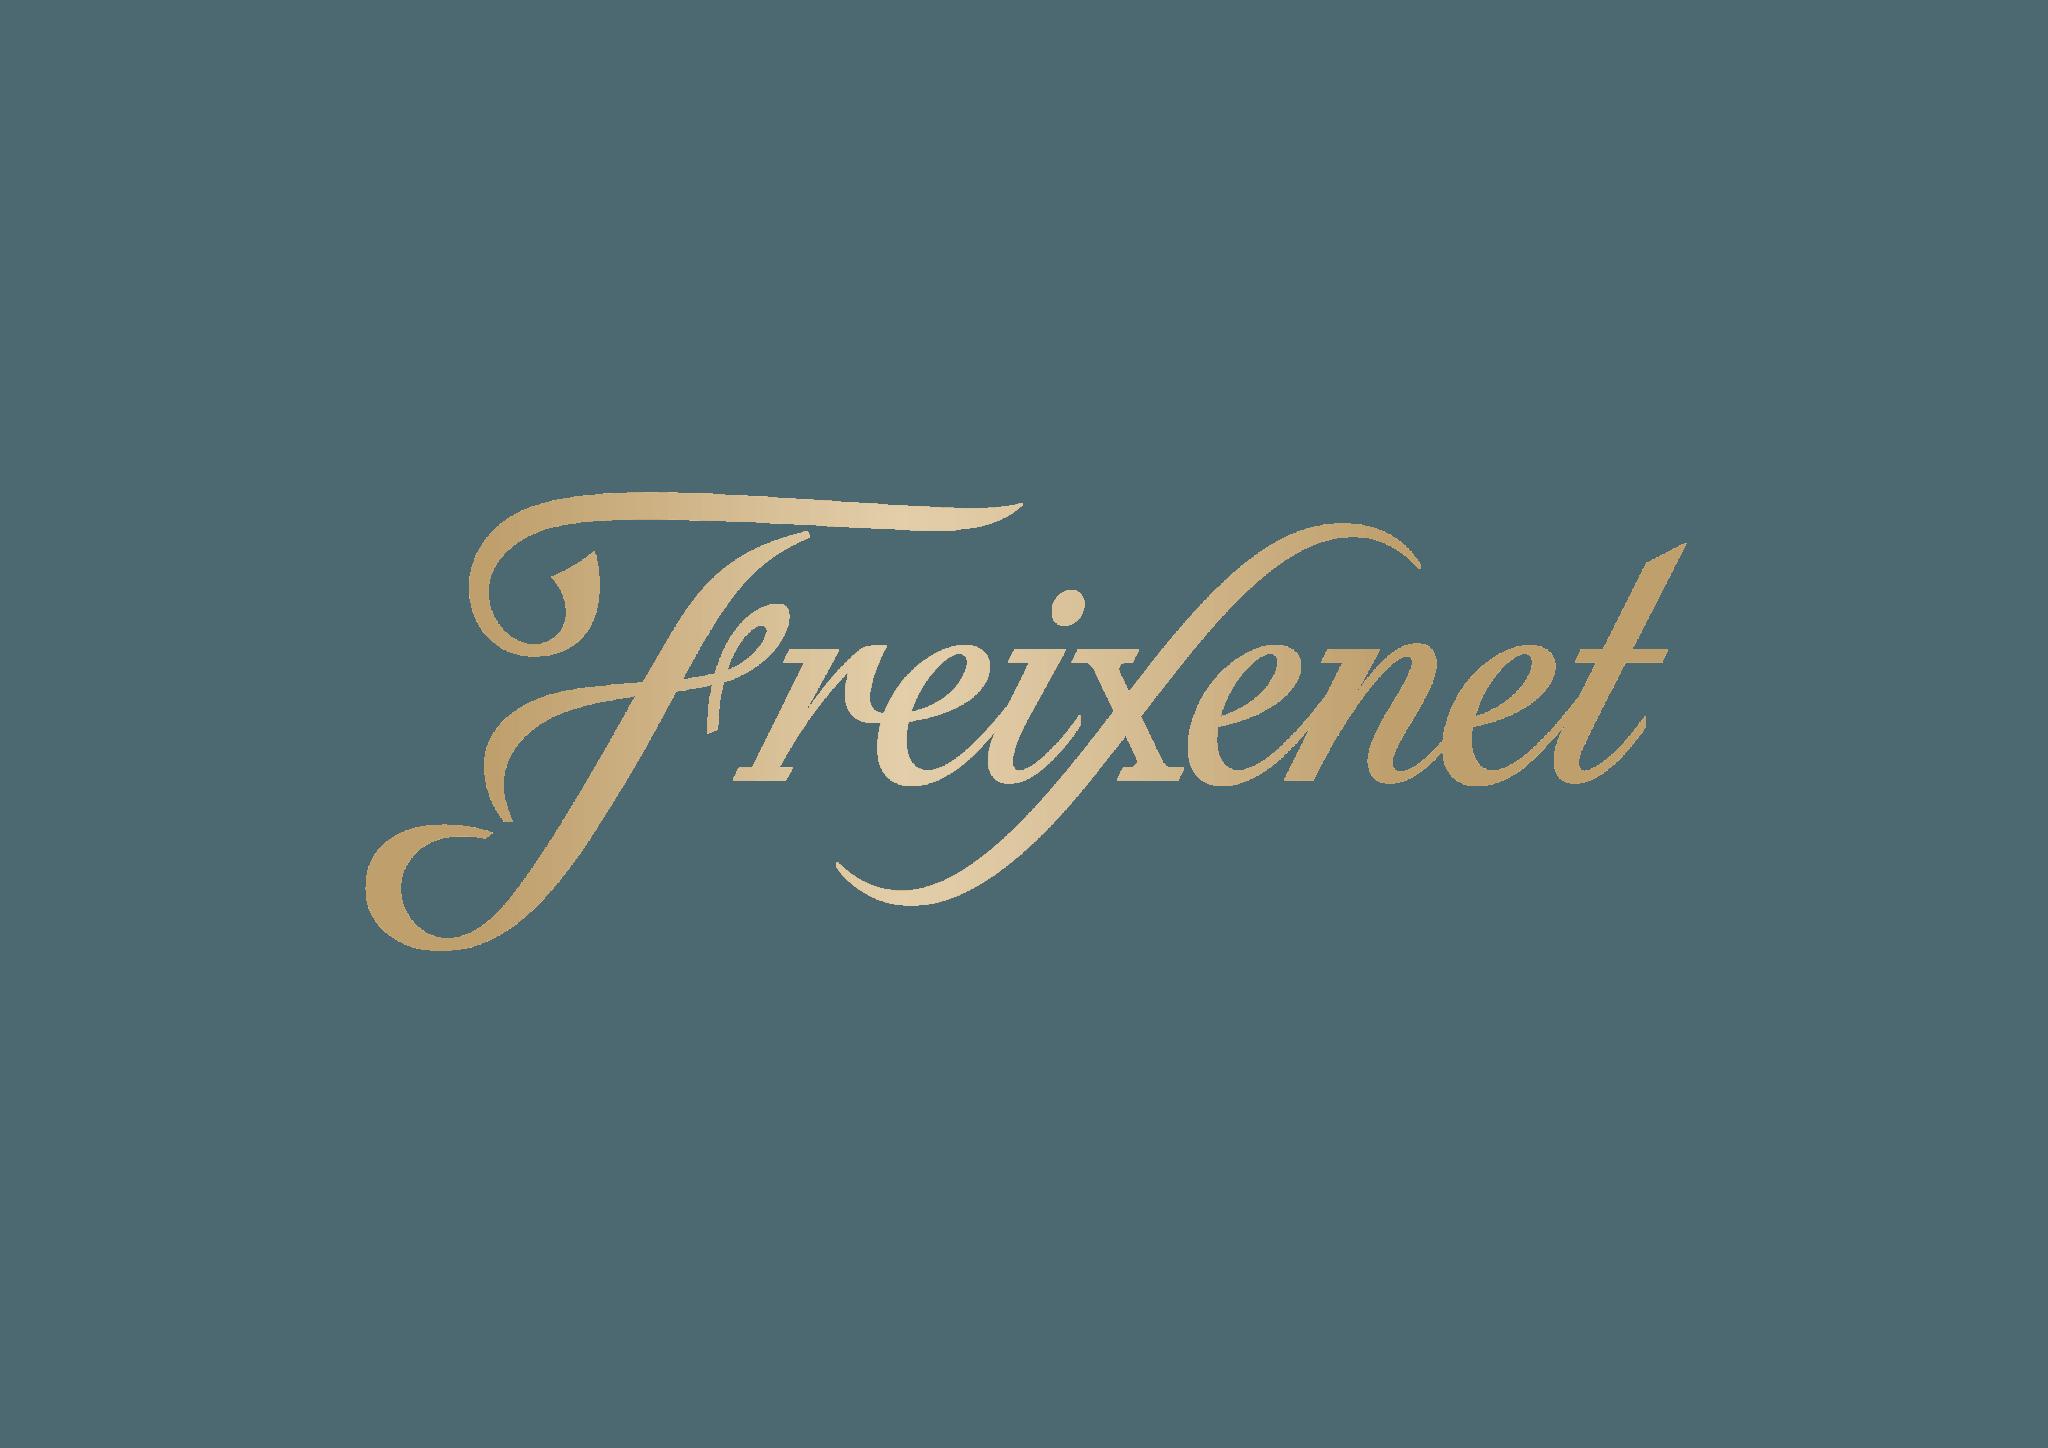 freixenet-gold-logo